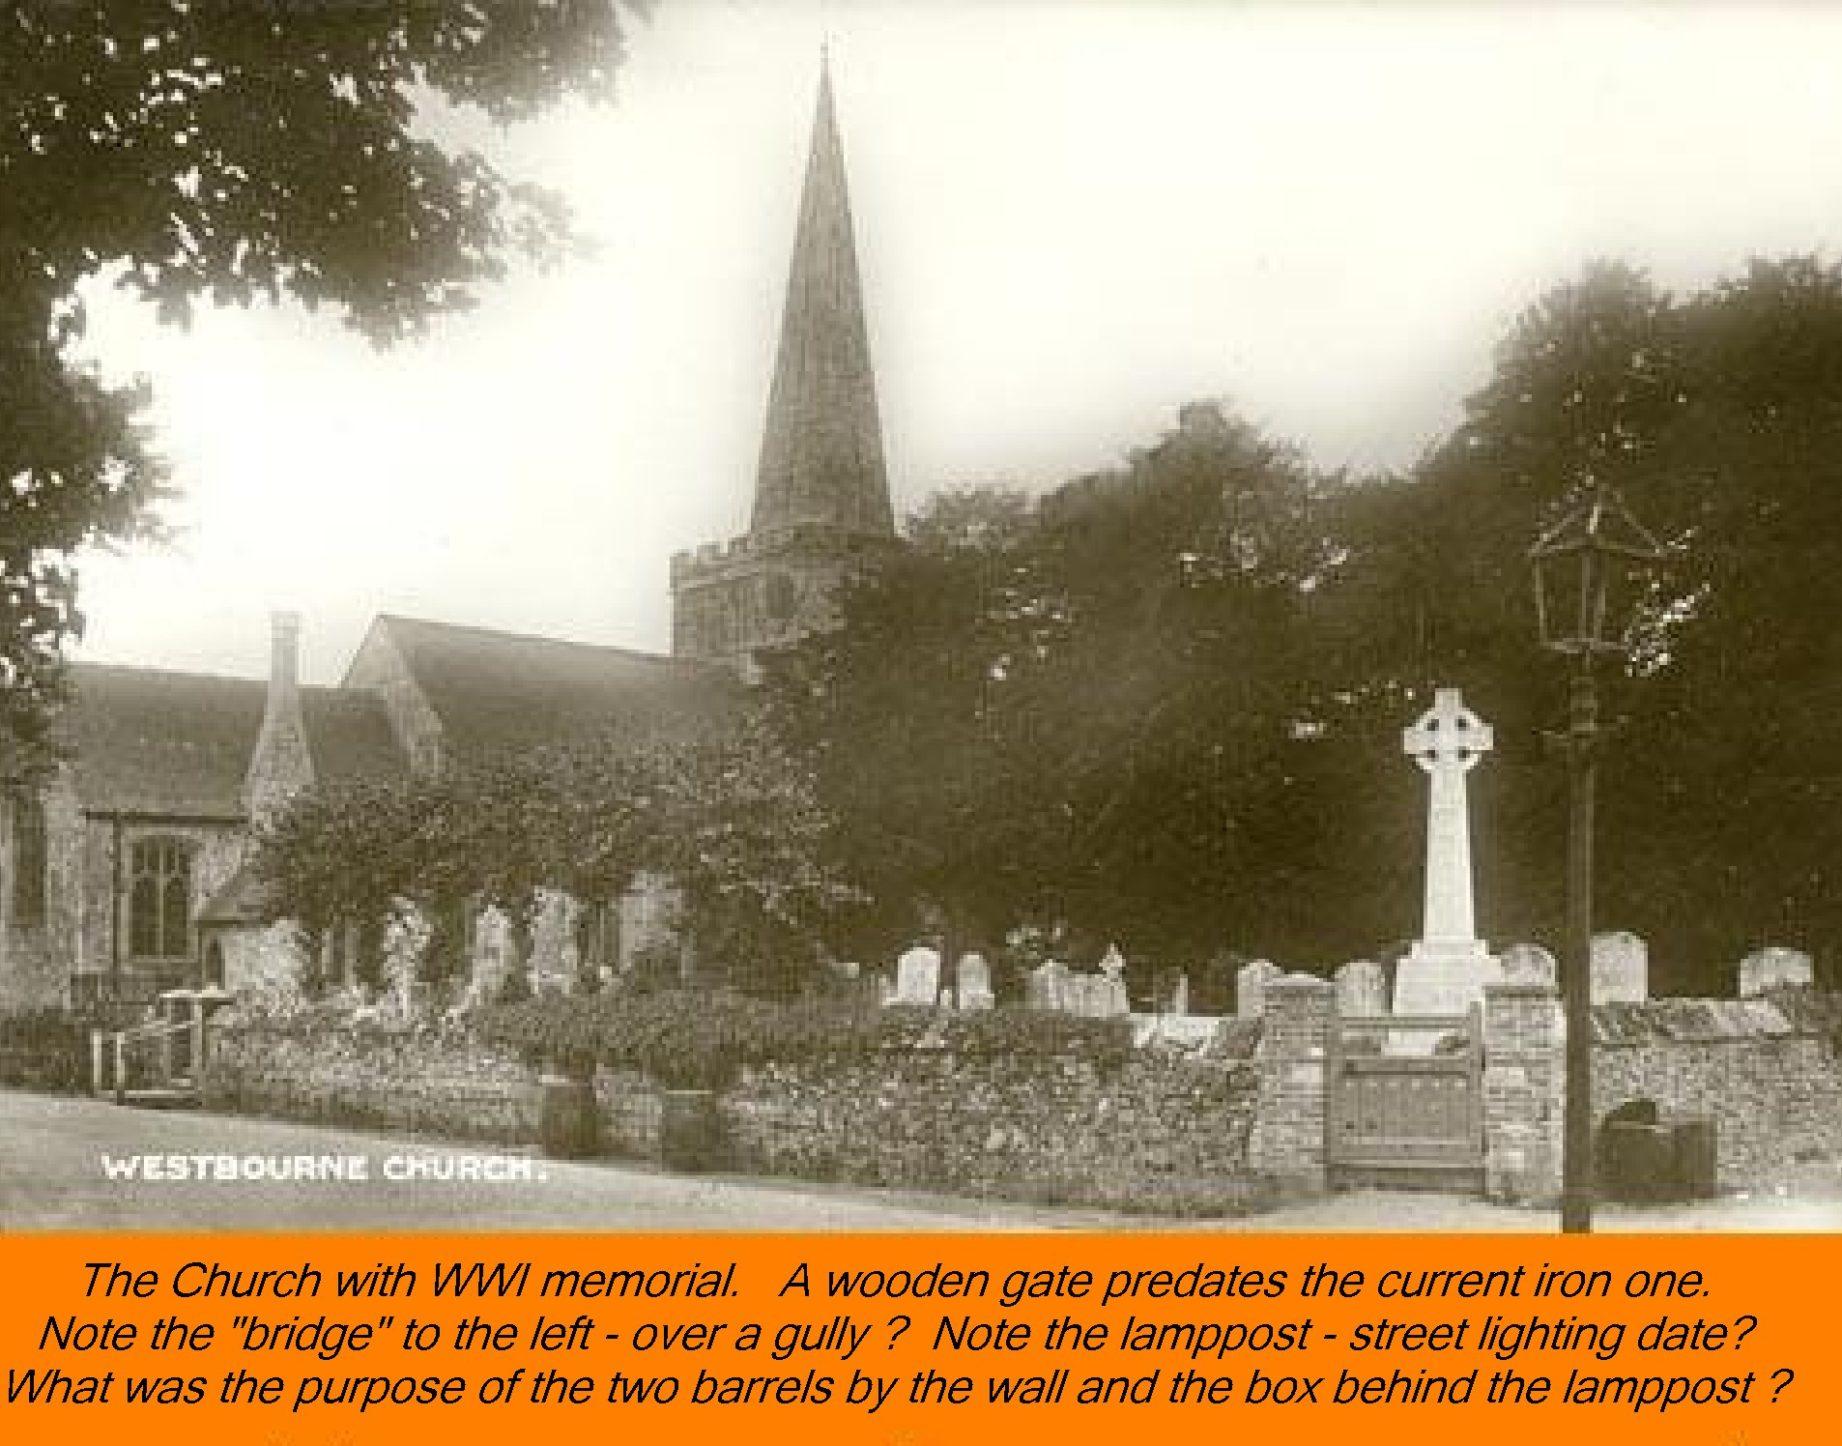 WESTBOURNE HISTORY PHOTO, CHURCH, St. JOHN, YEW, INTERIOR, SCREEN, MEMORIAL, CHURCHYARD